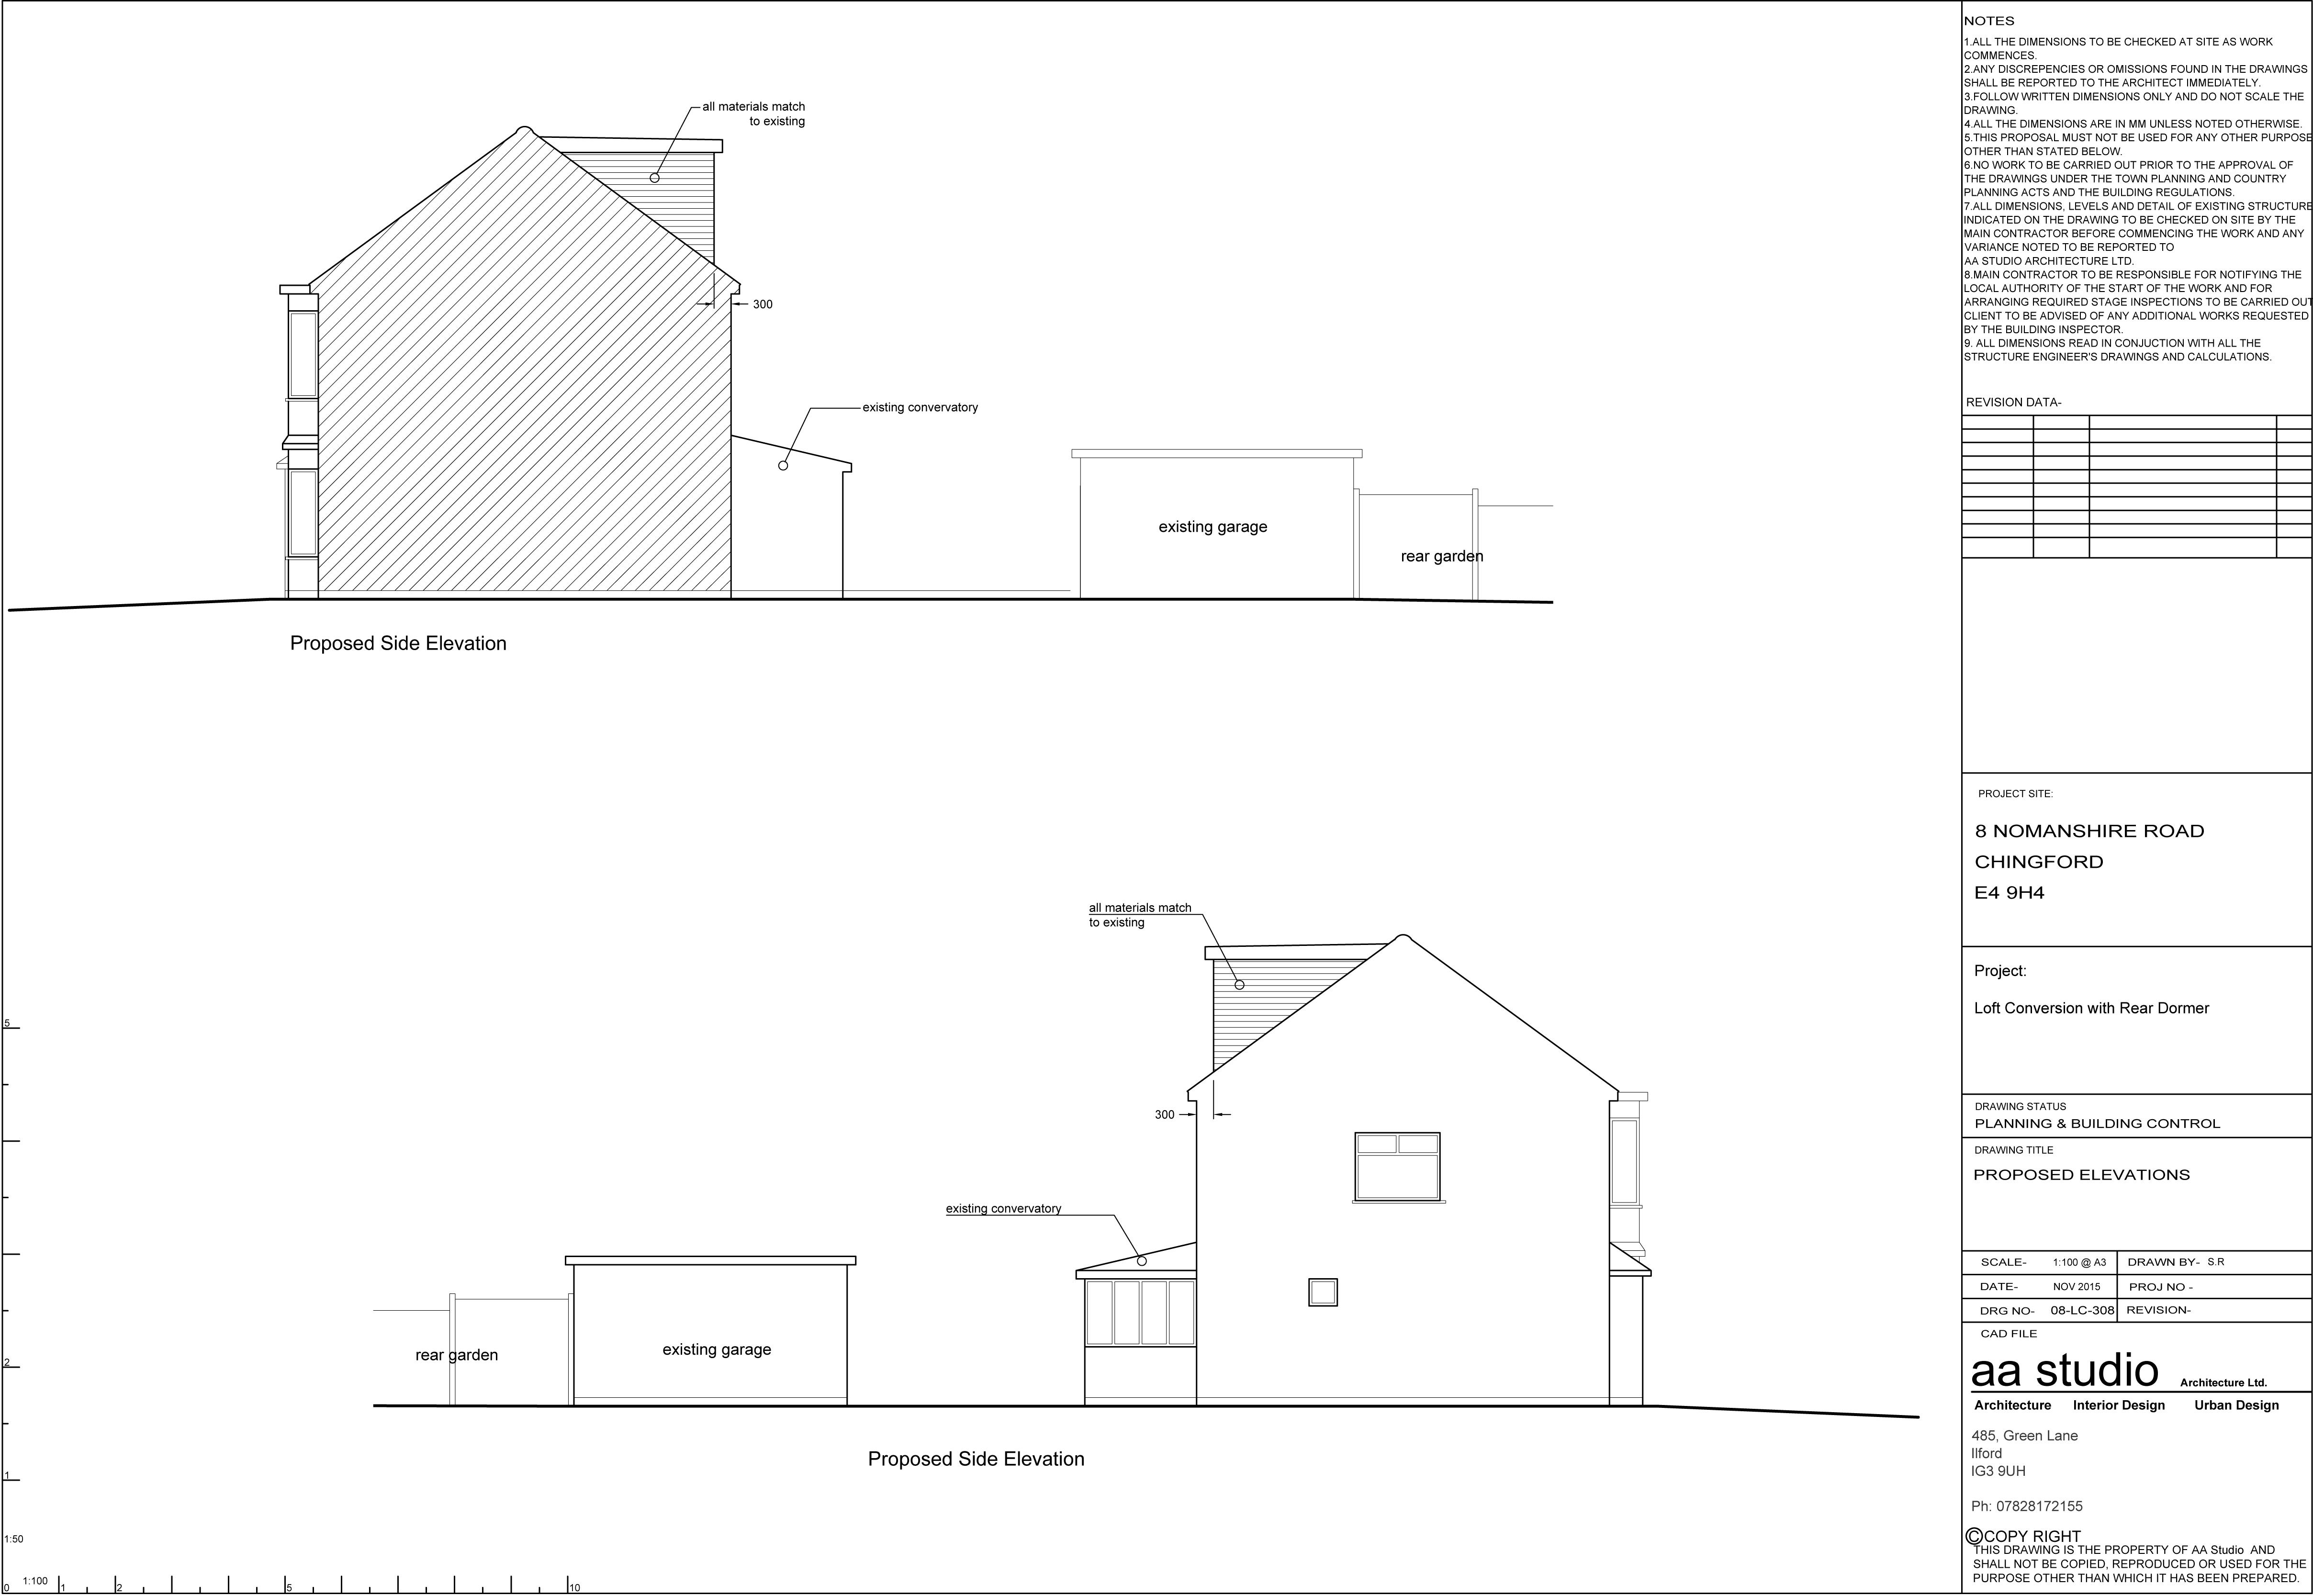 Loft Conversion Chingford